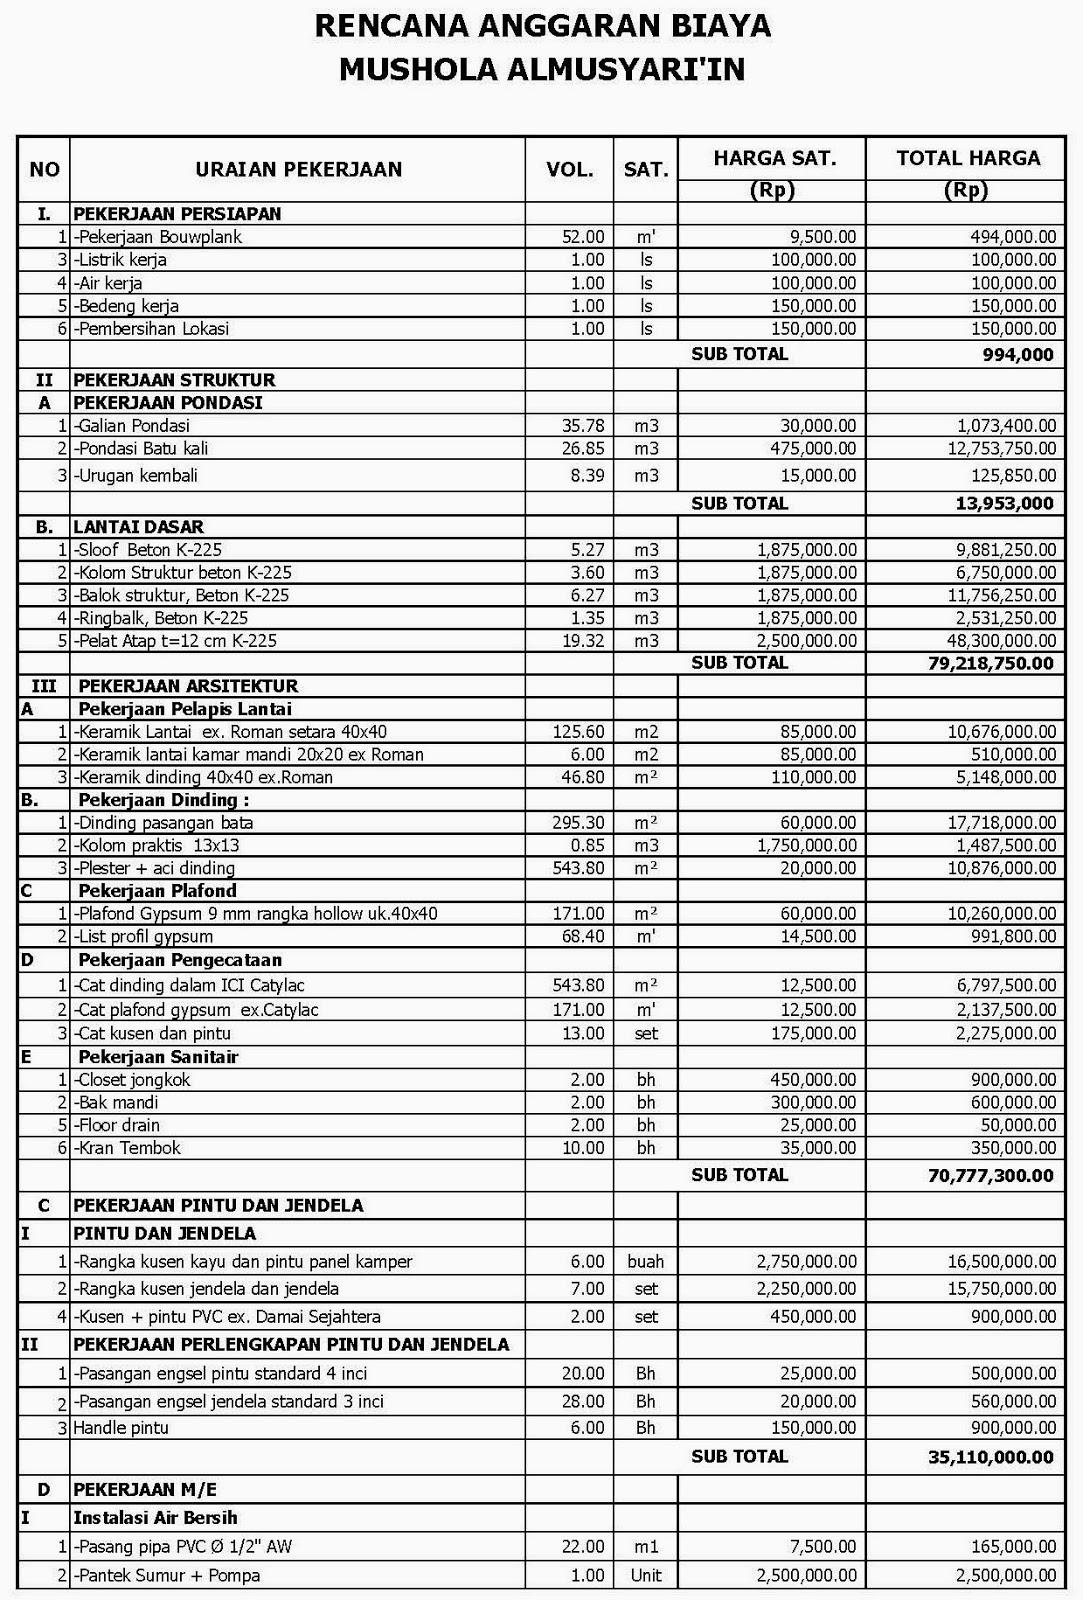 Rencana Anggaran Biaya Pembangunan Masjid Rencana Anggaran Biaya Yang